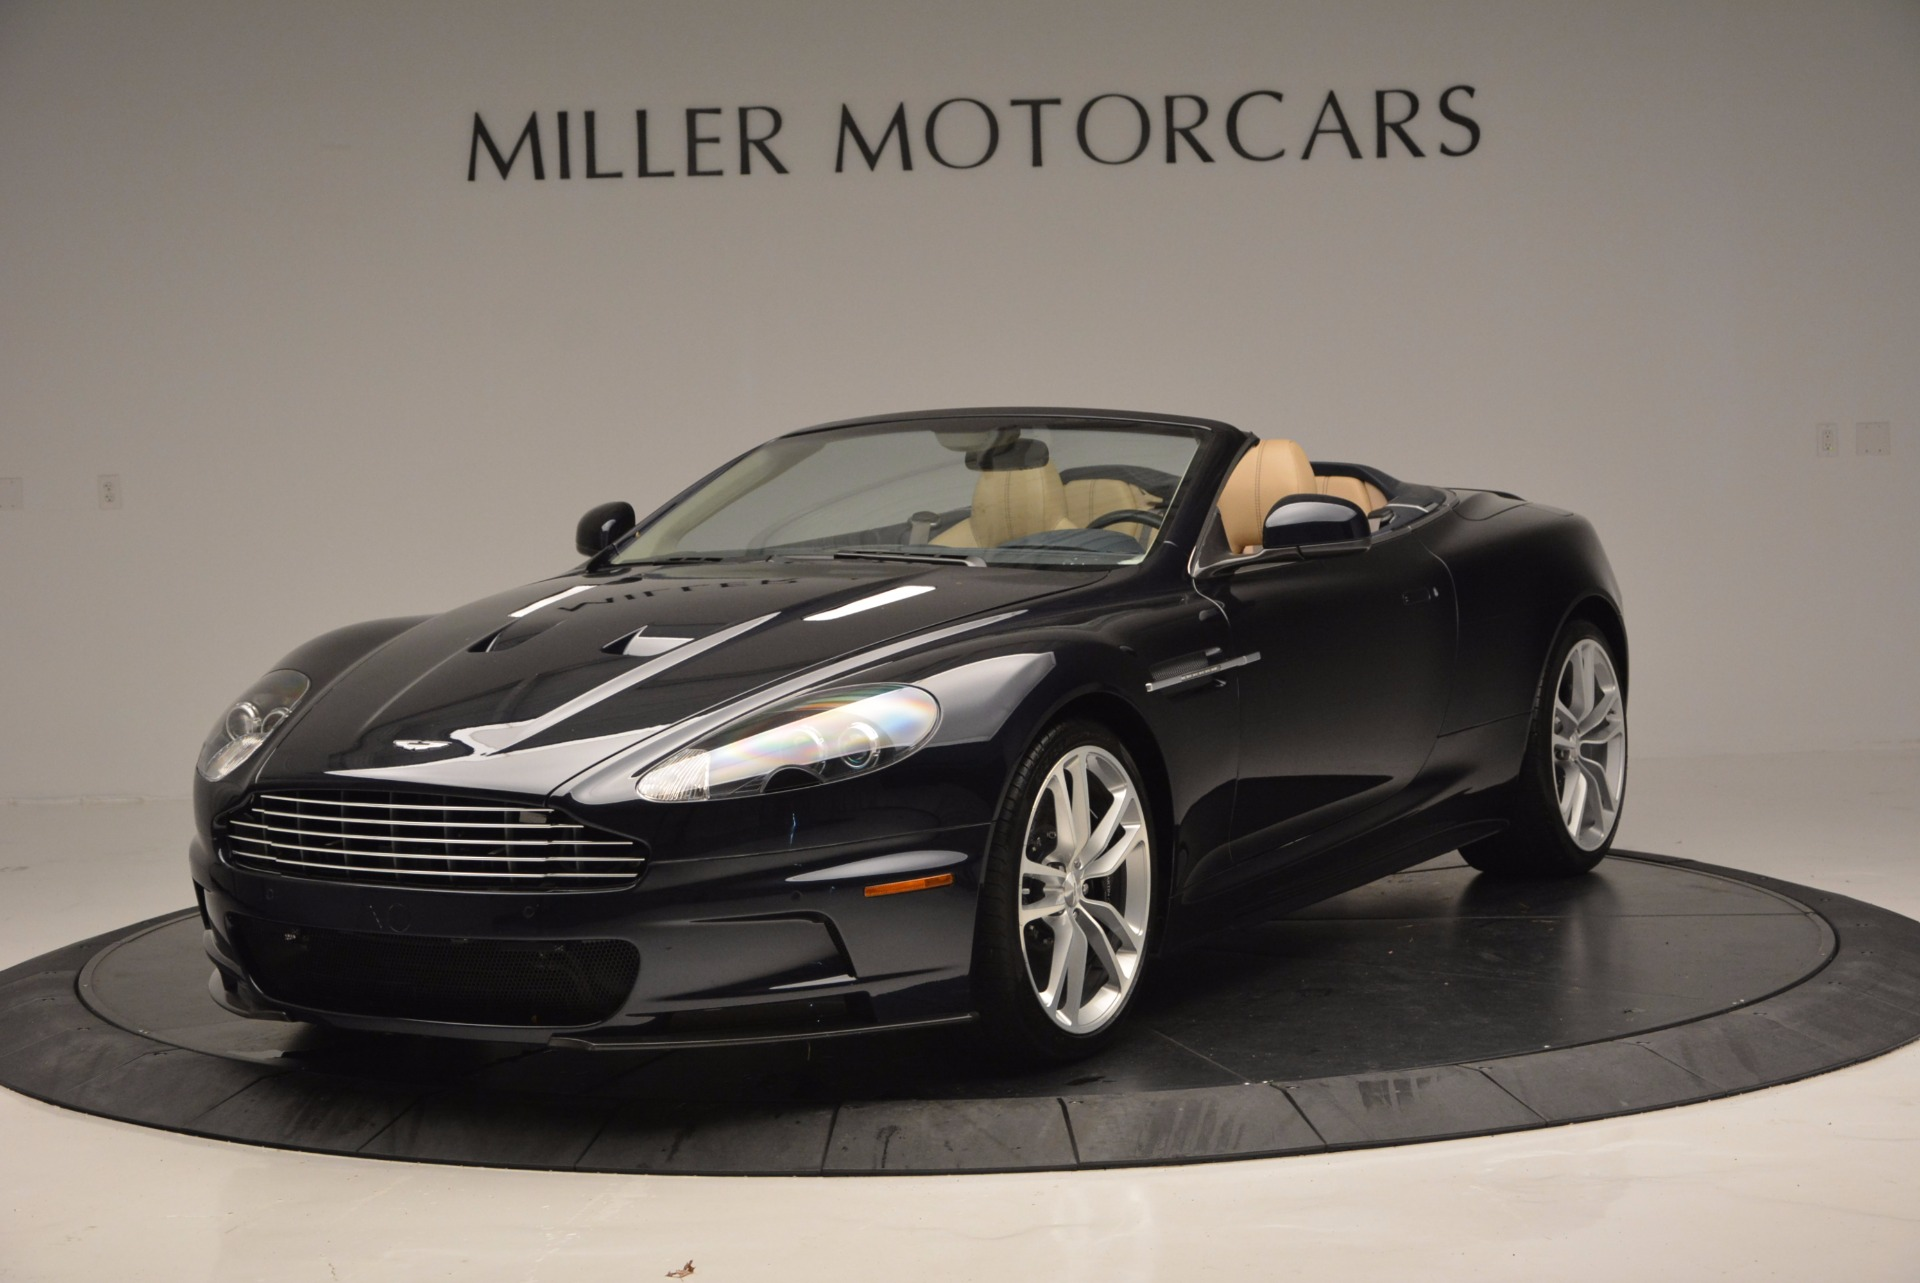 Used 2012 Aston Martin DBS Volante for sale Sold at Bugatti of Greenwich in Greenwich CT 06830 1